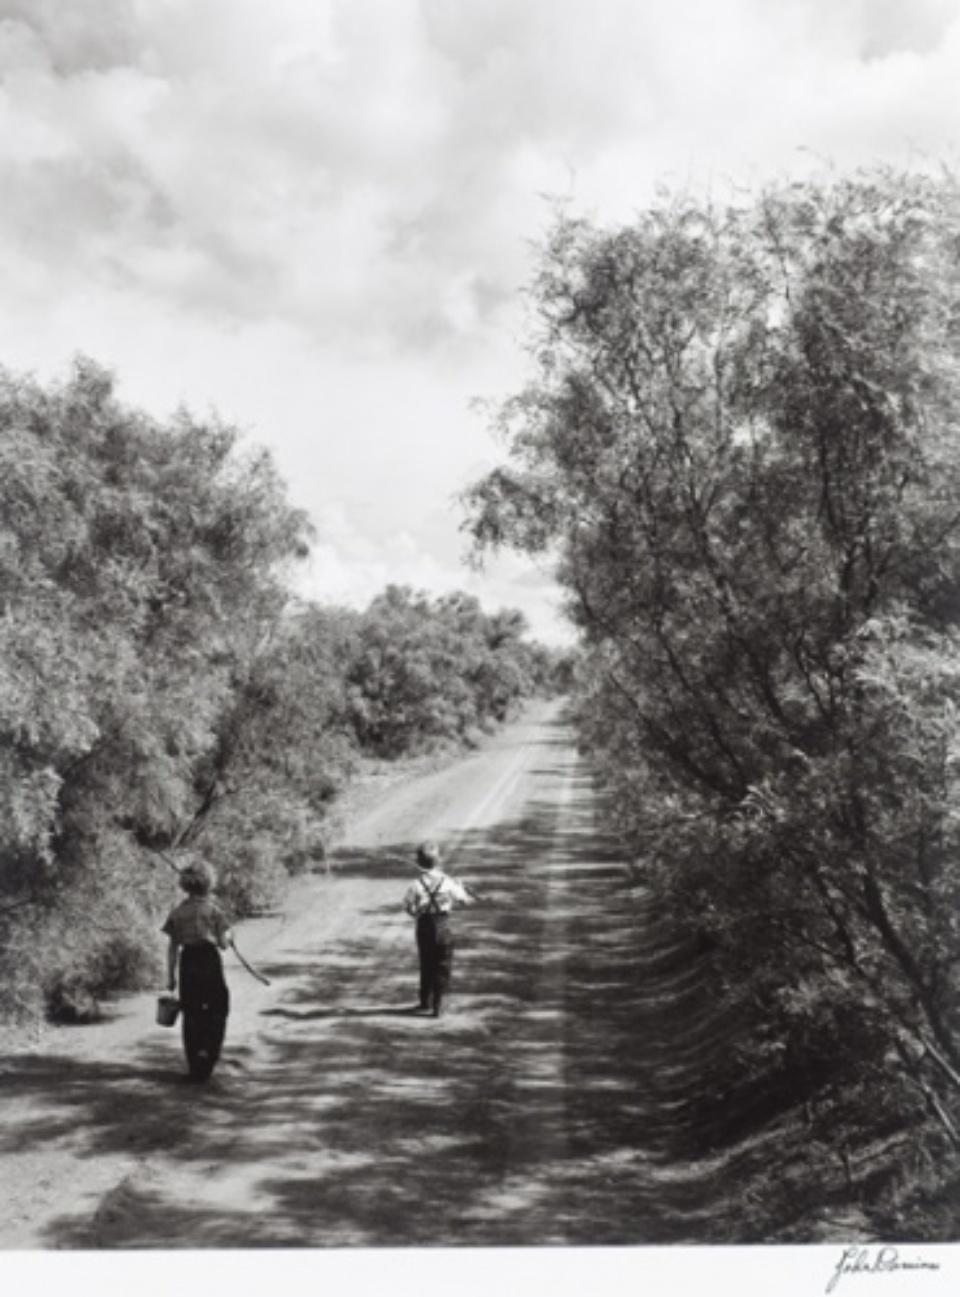 John Dominis Going fishing Texas, 1952 Gelatin Silver Print